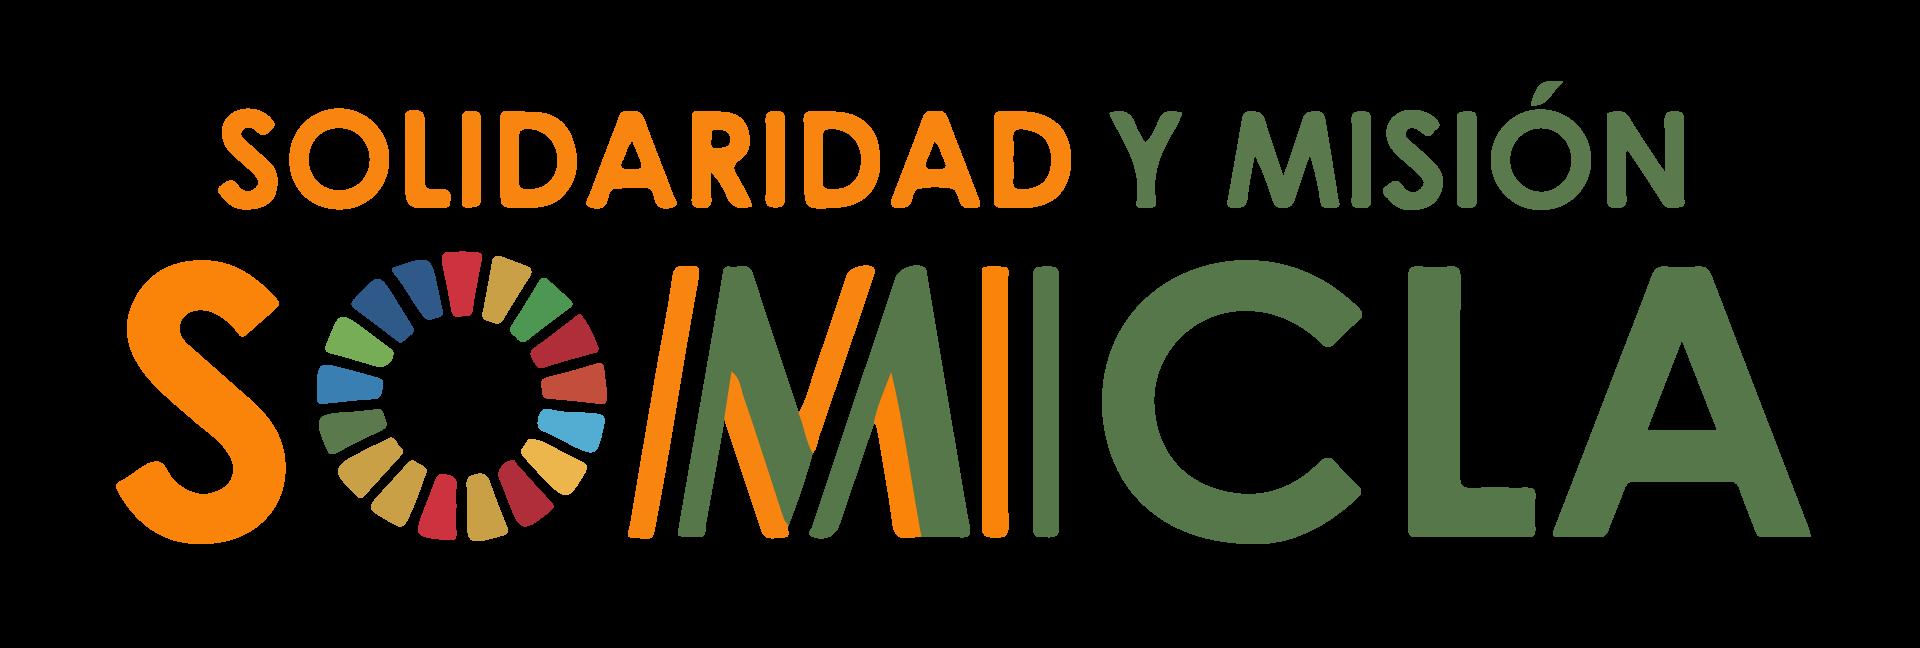 SOMICLA logo